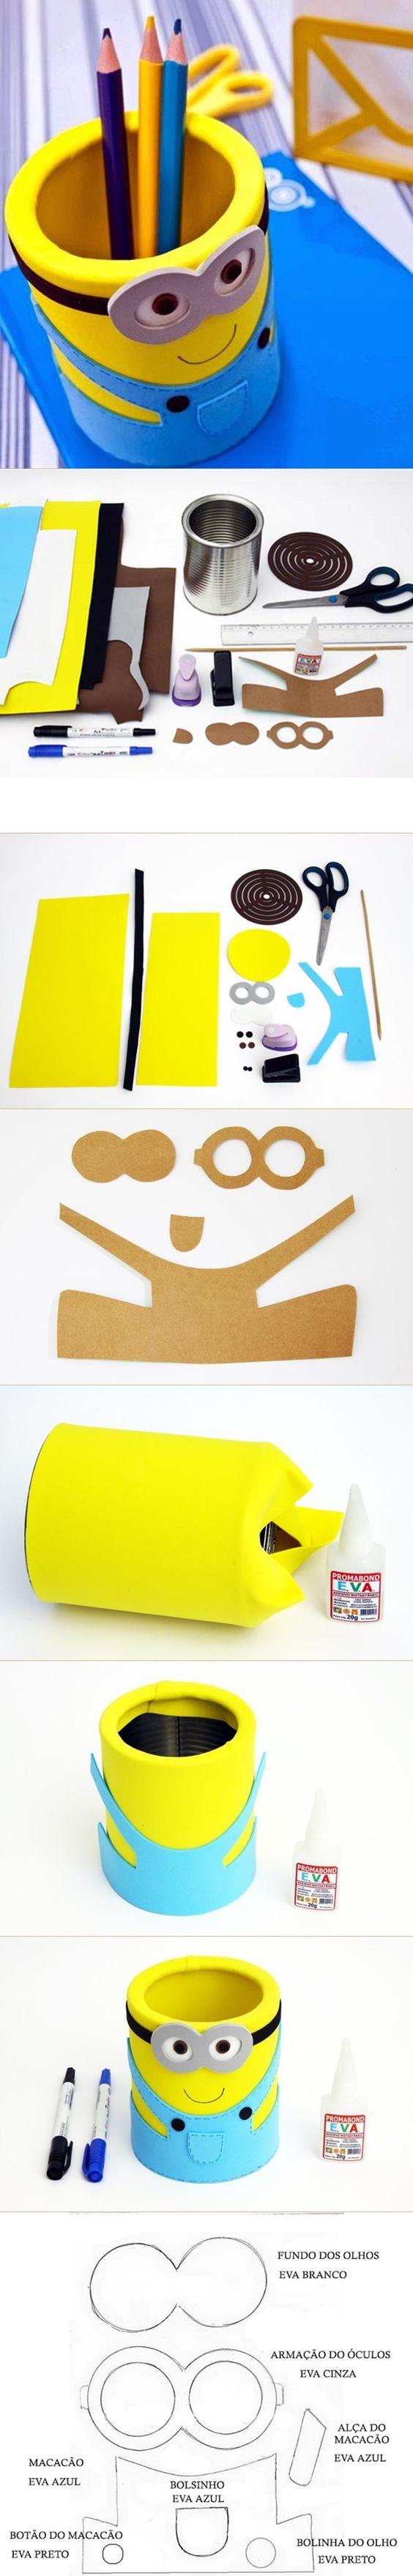 Manualidades muy divertidas con materiales de Néstor P. Carrara SRL. Contacto l…